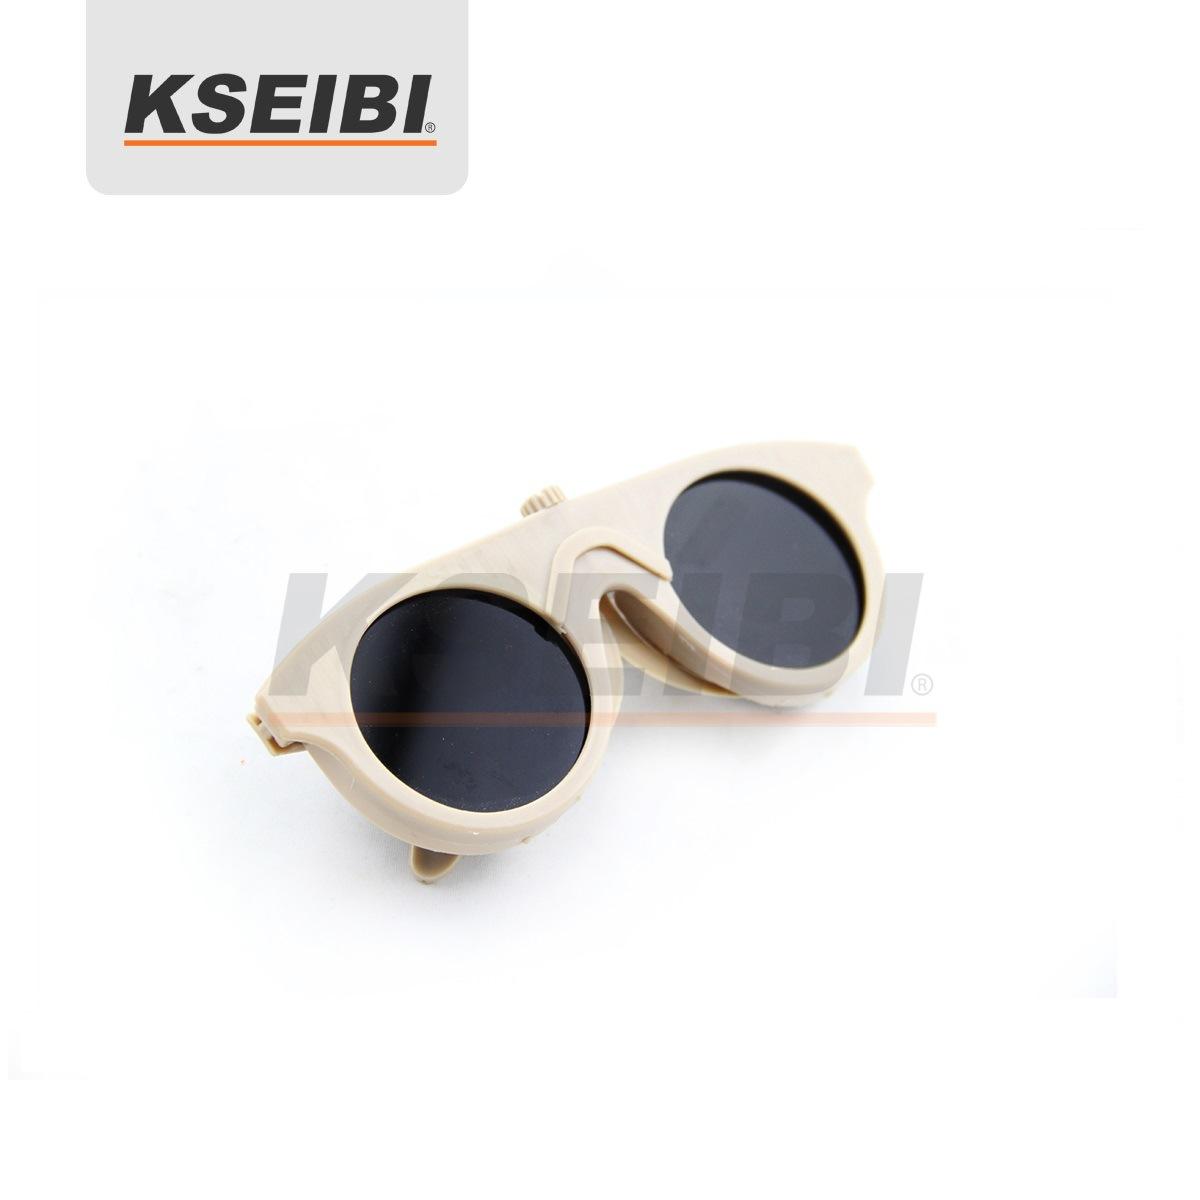 High Quality German Type Kseibi PC Eye Protect Welding Goggles